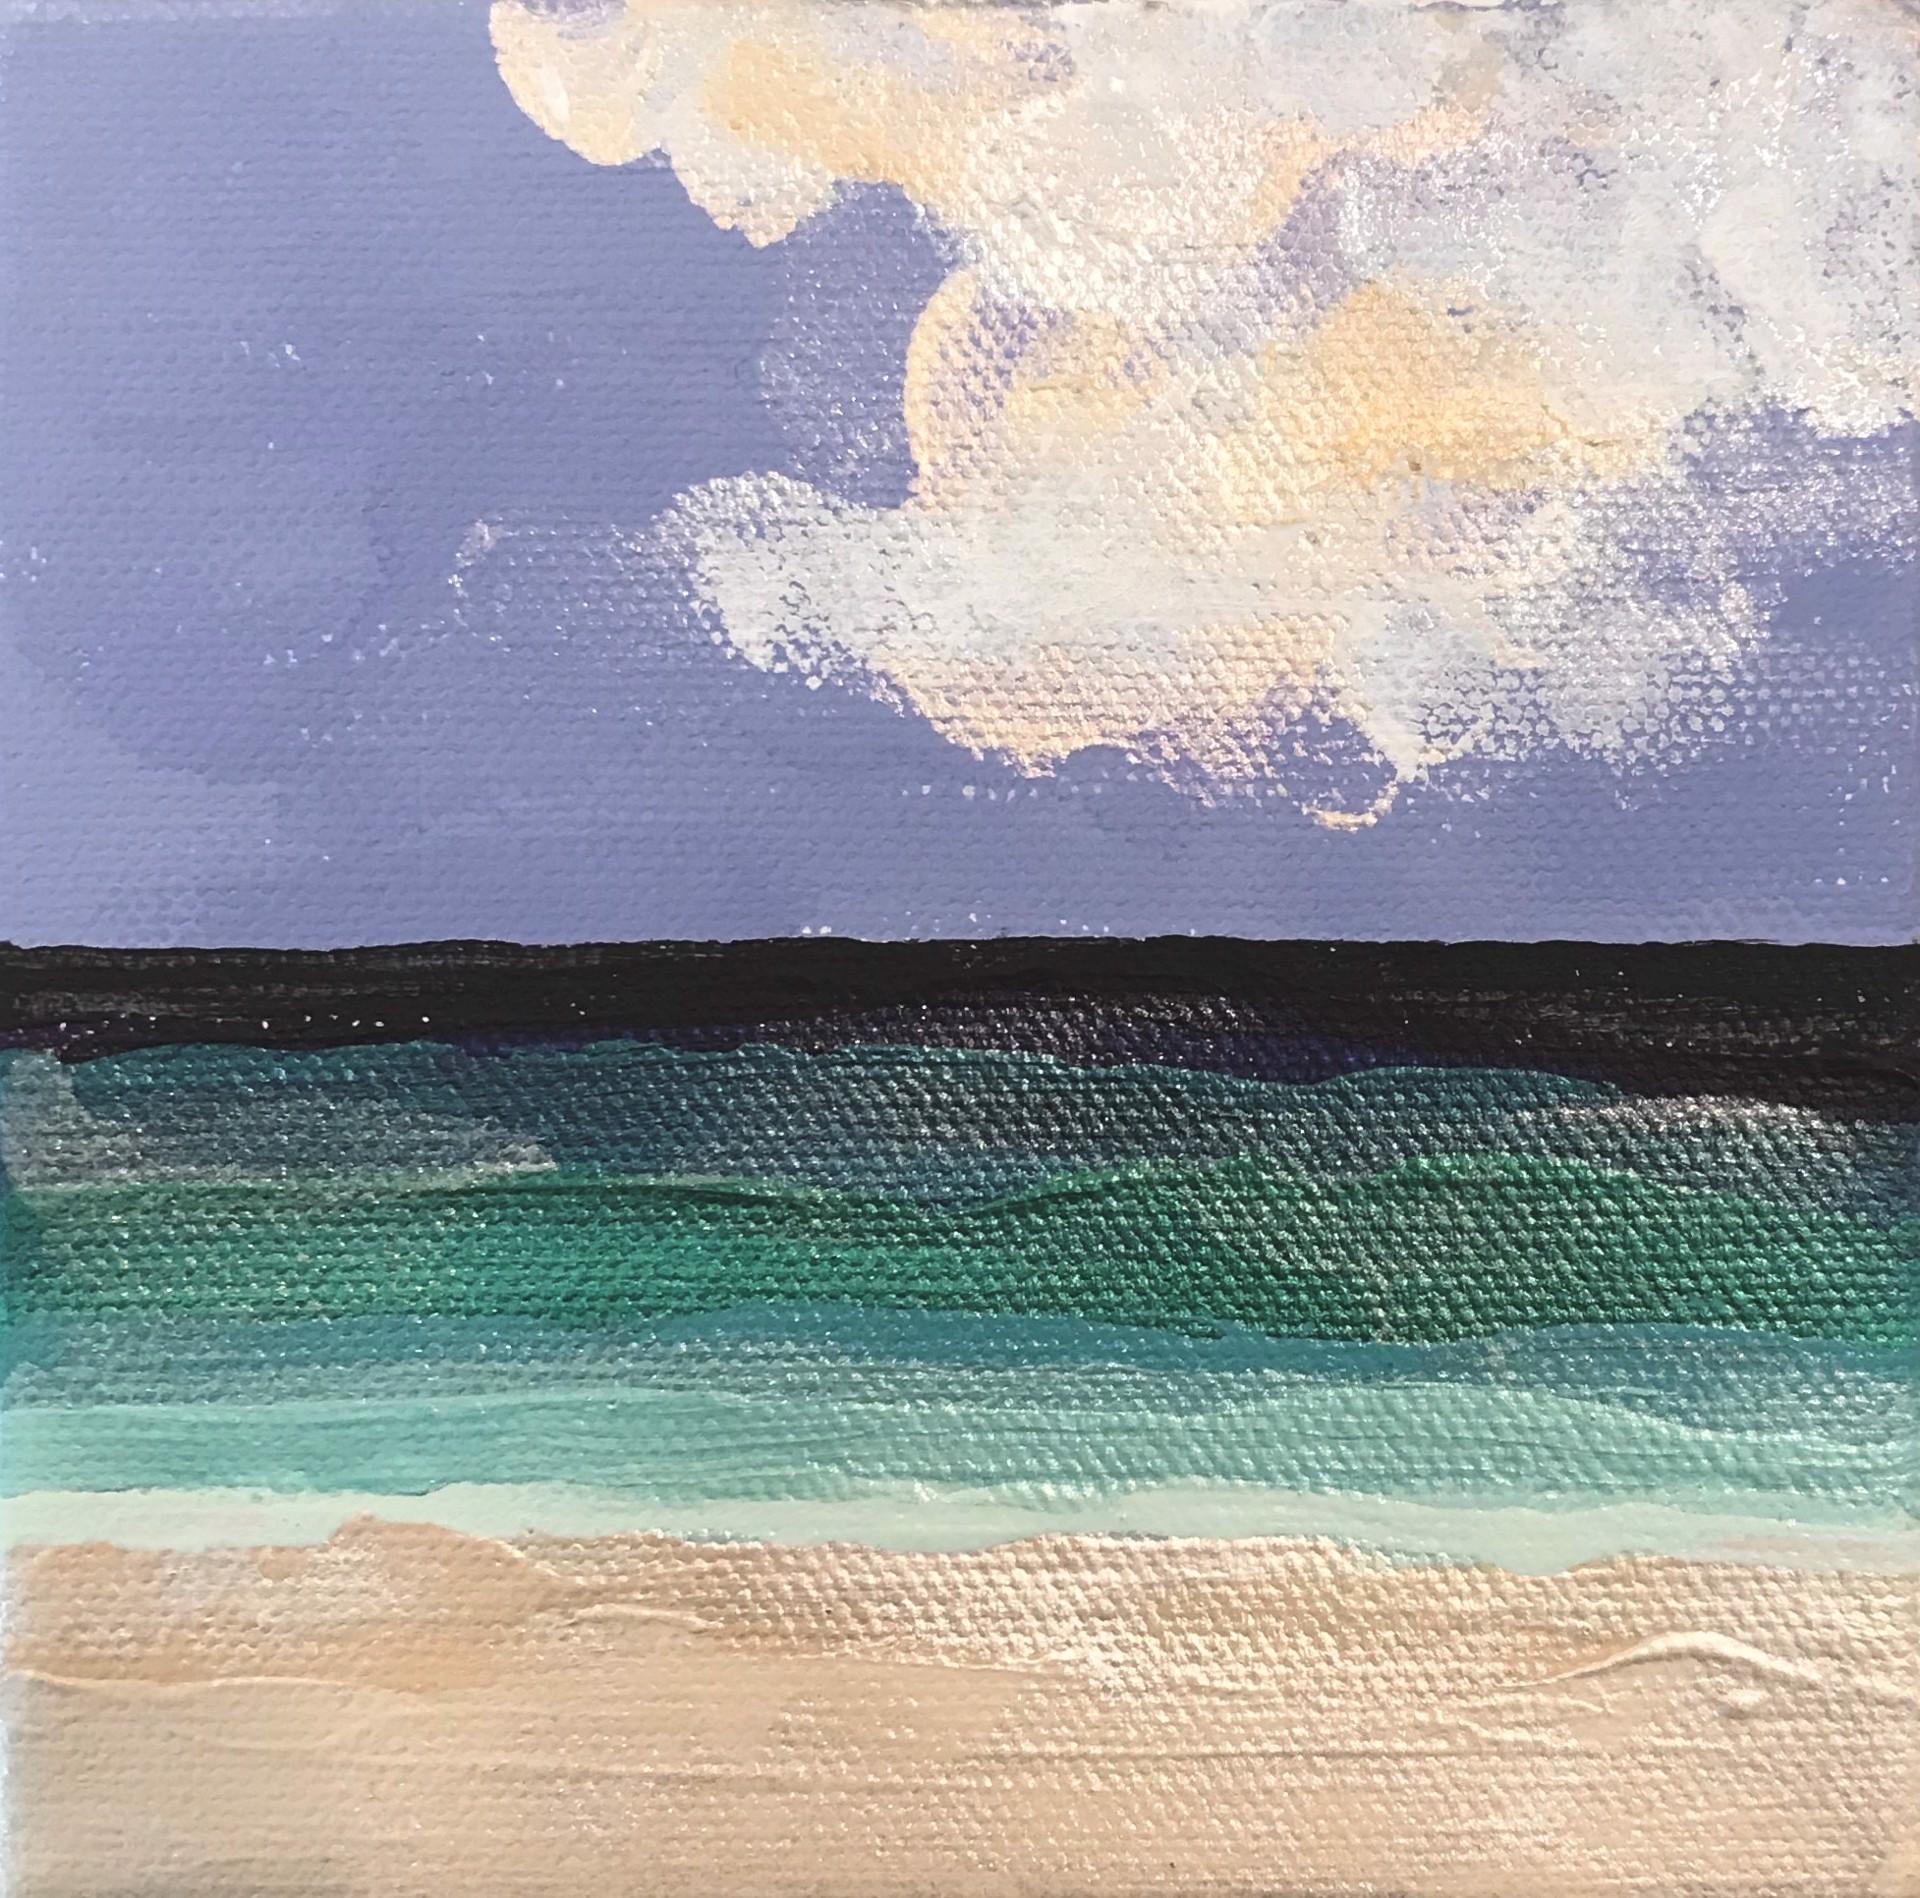 Beachfront No. 7 by Leslie Poteet Busker